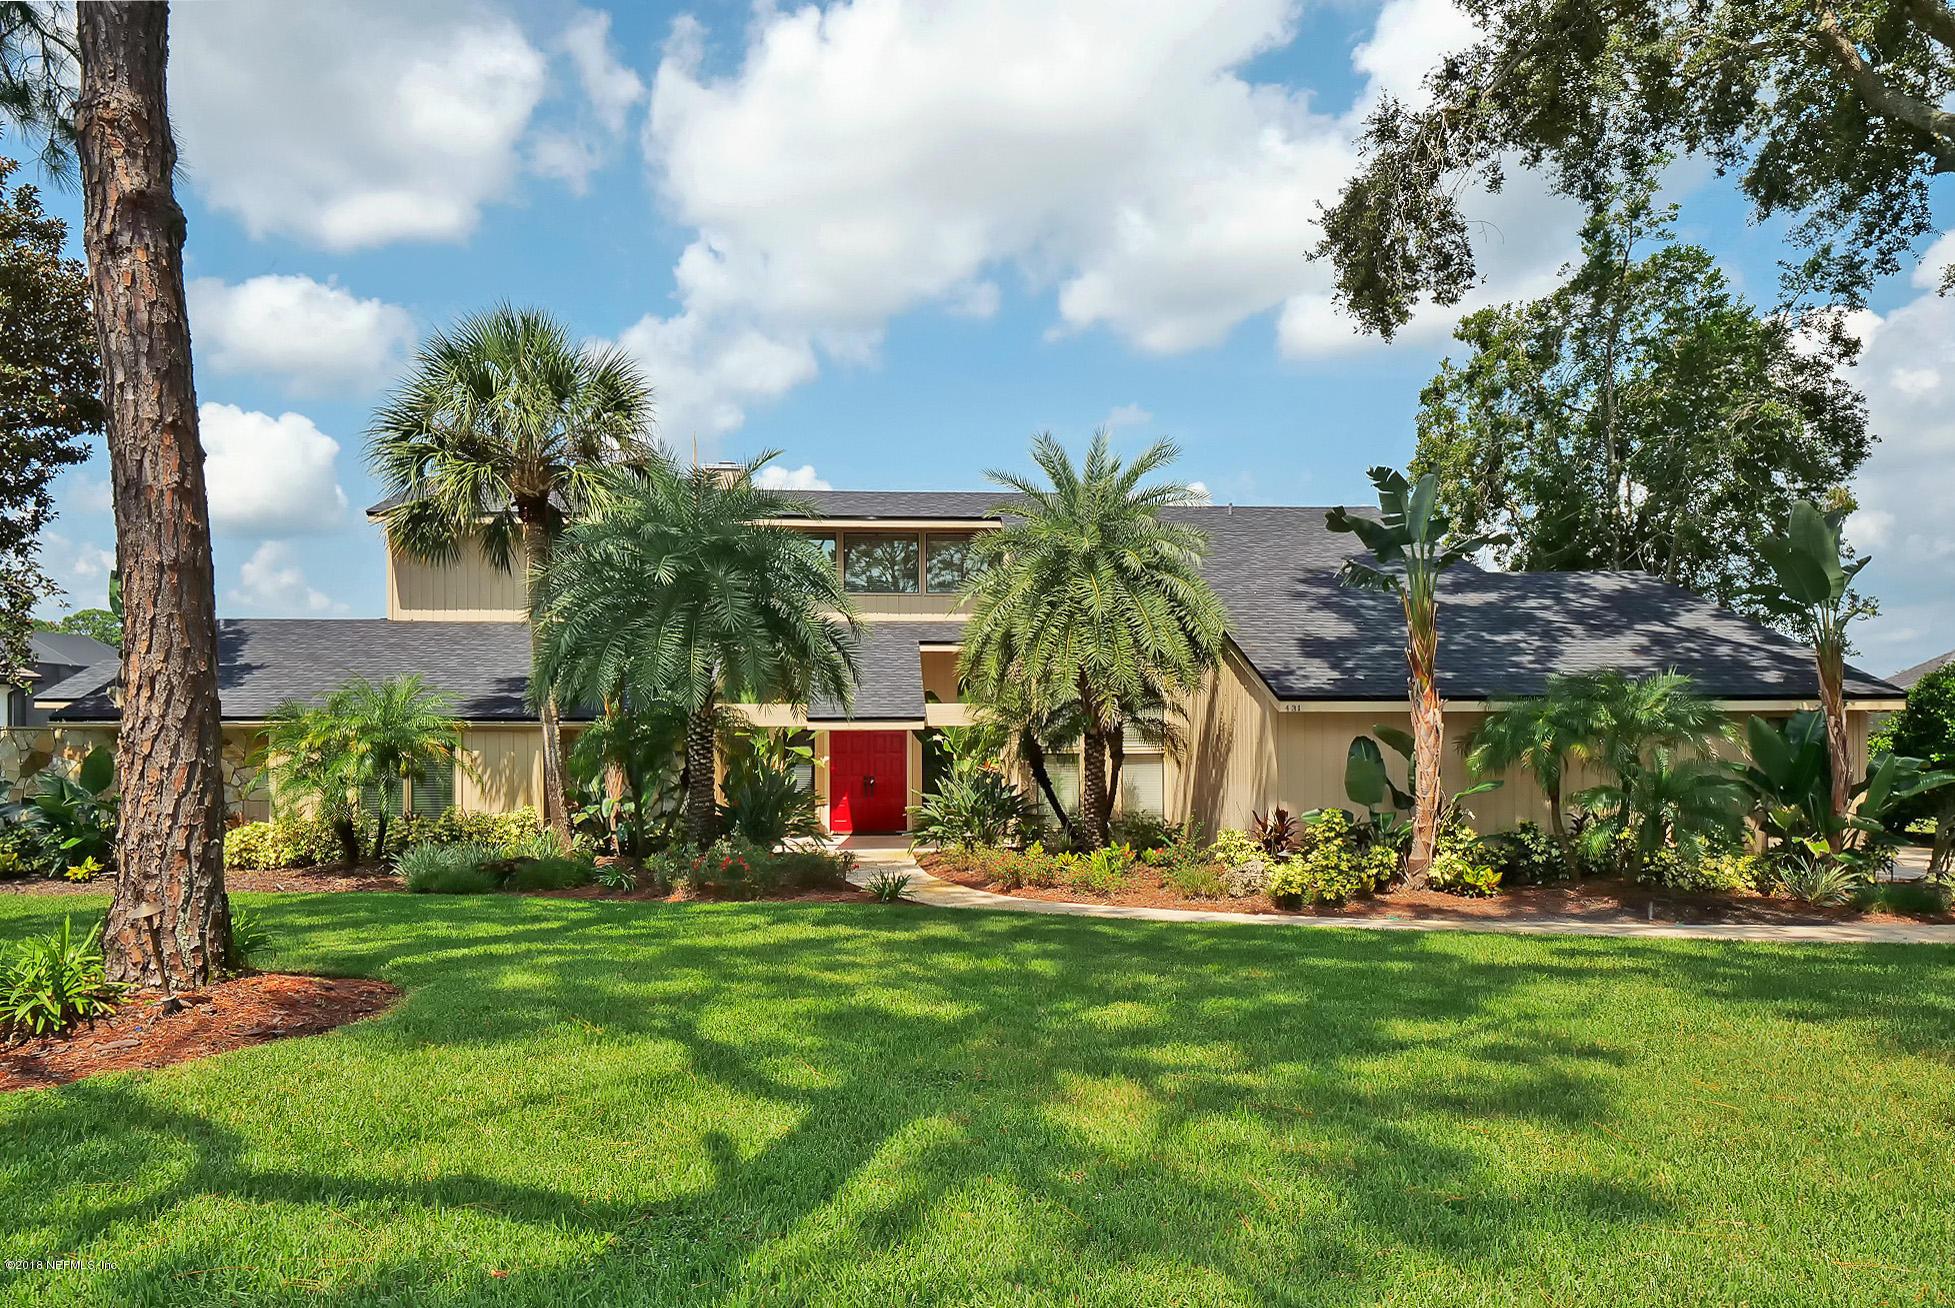 431 OSPREY, PONTE VEDRA BEACH, FLORIDA 32082, 3 Bedrooms Bedrooms, ,3 BathroomsBathrooms,Residential - single family,For sale,OSPREY,955405